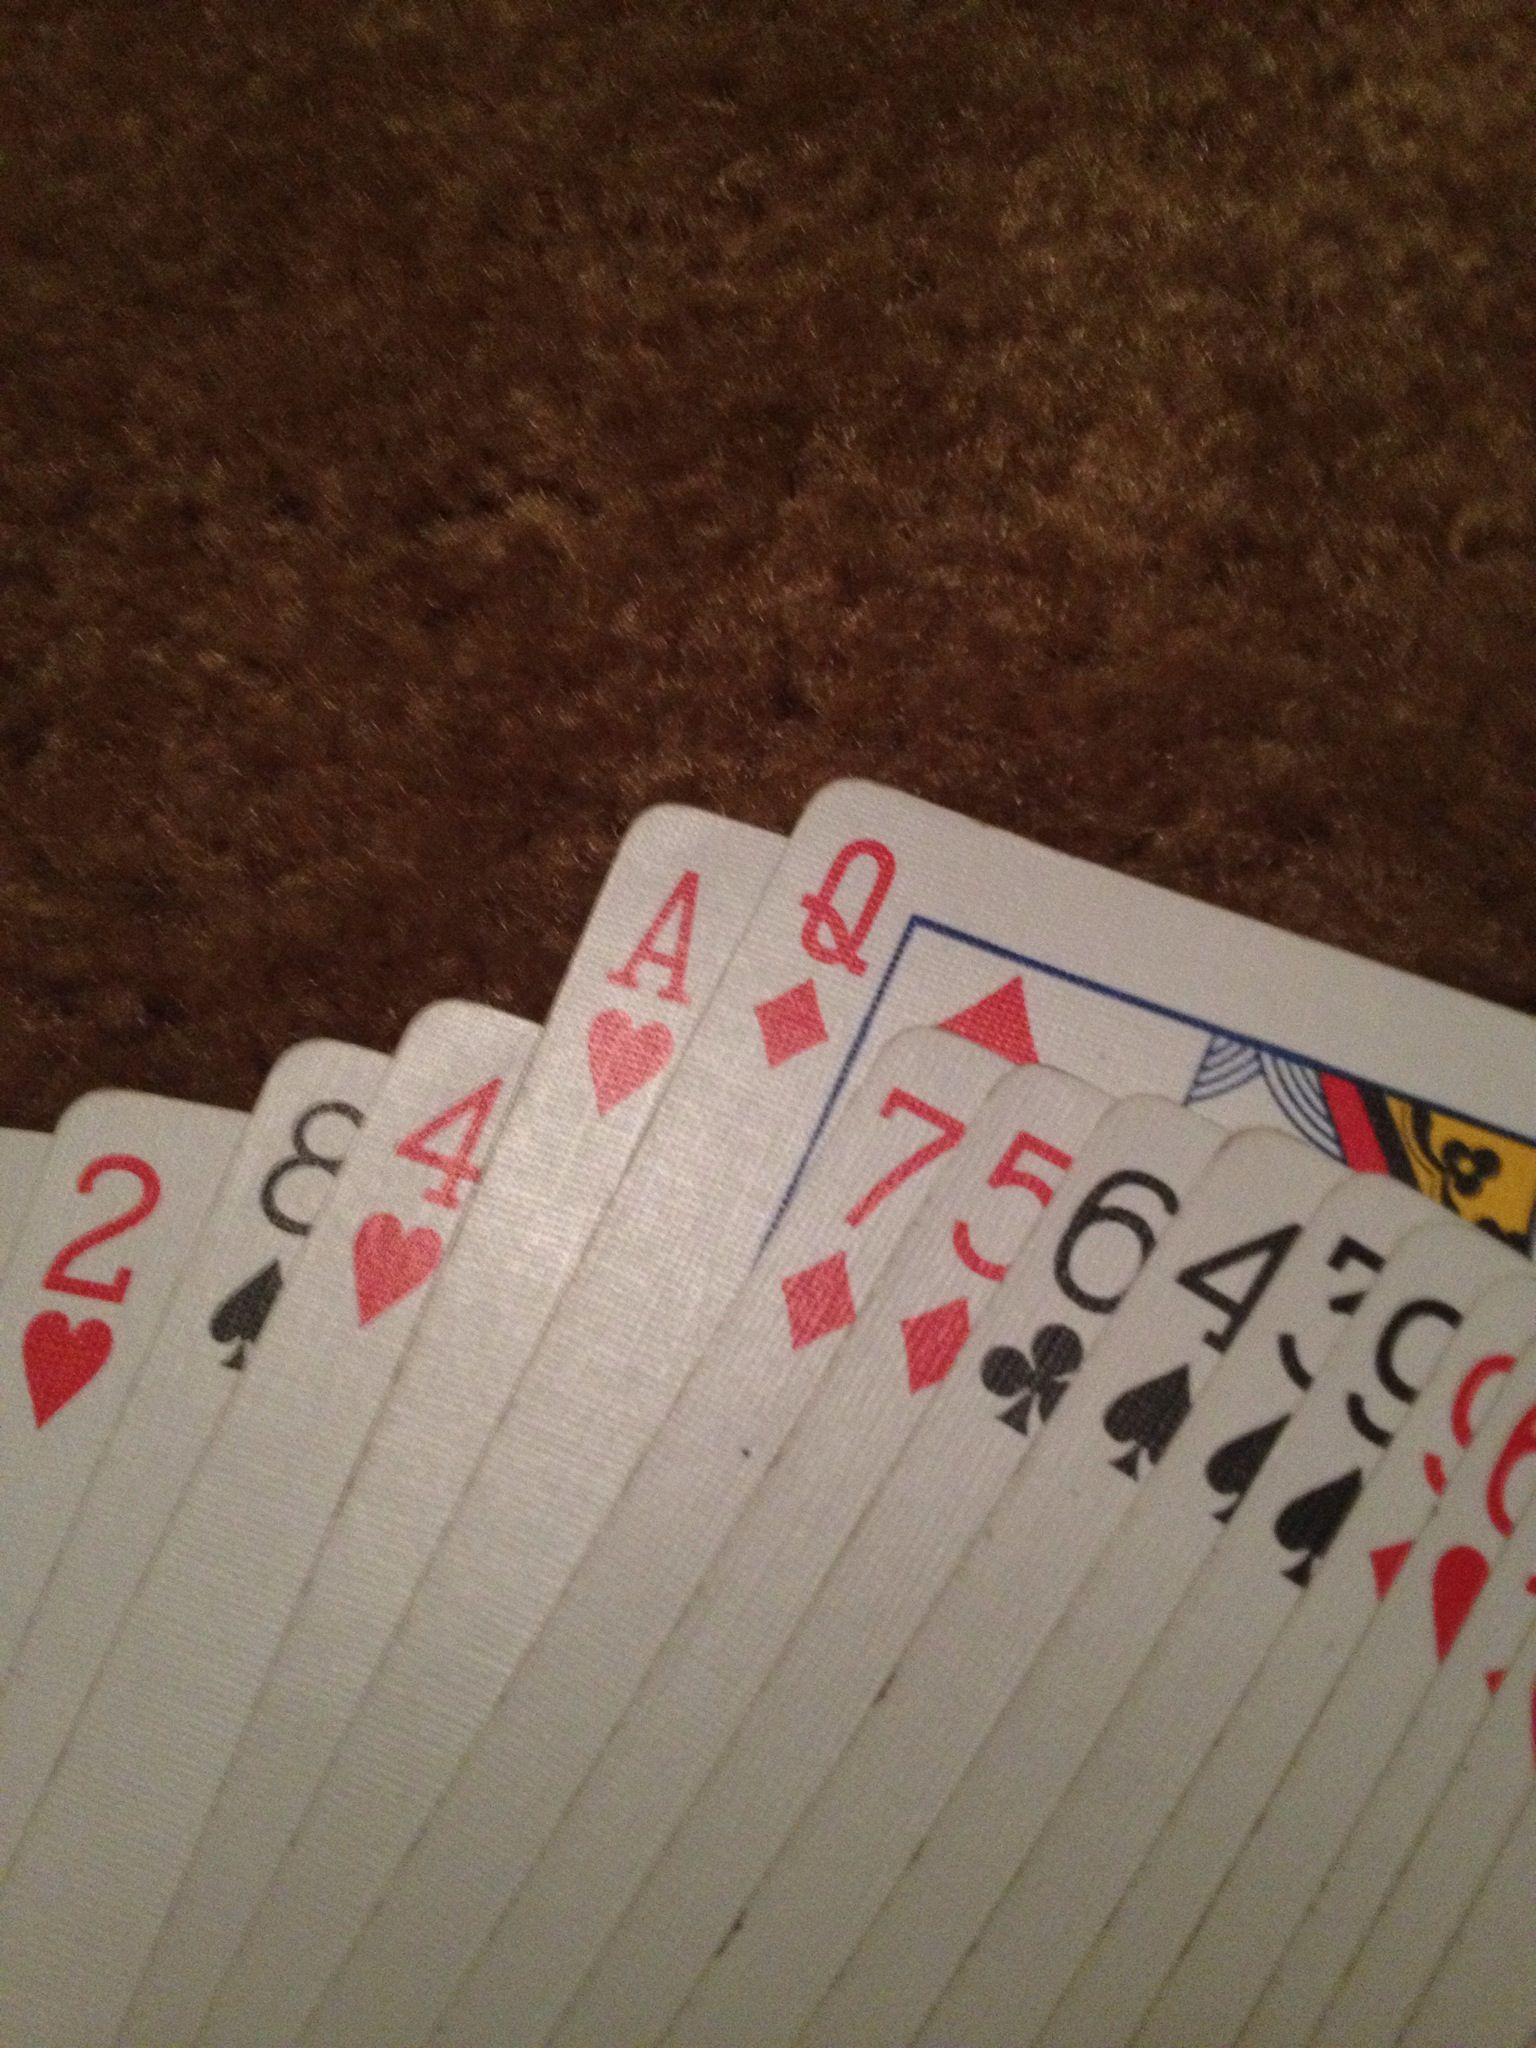 How To Do A Simple Card Trick Recipe Easy Card Tricks Card